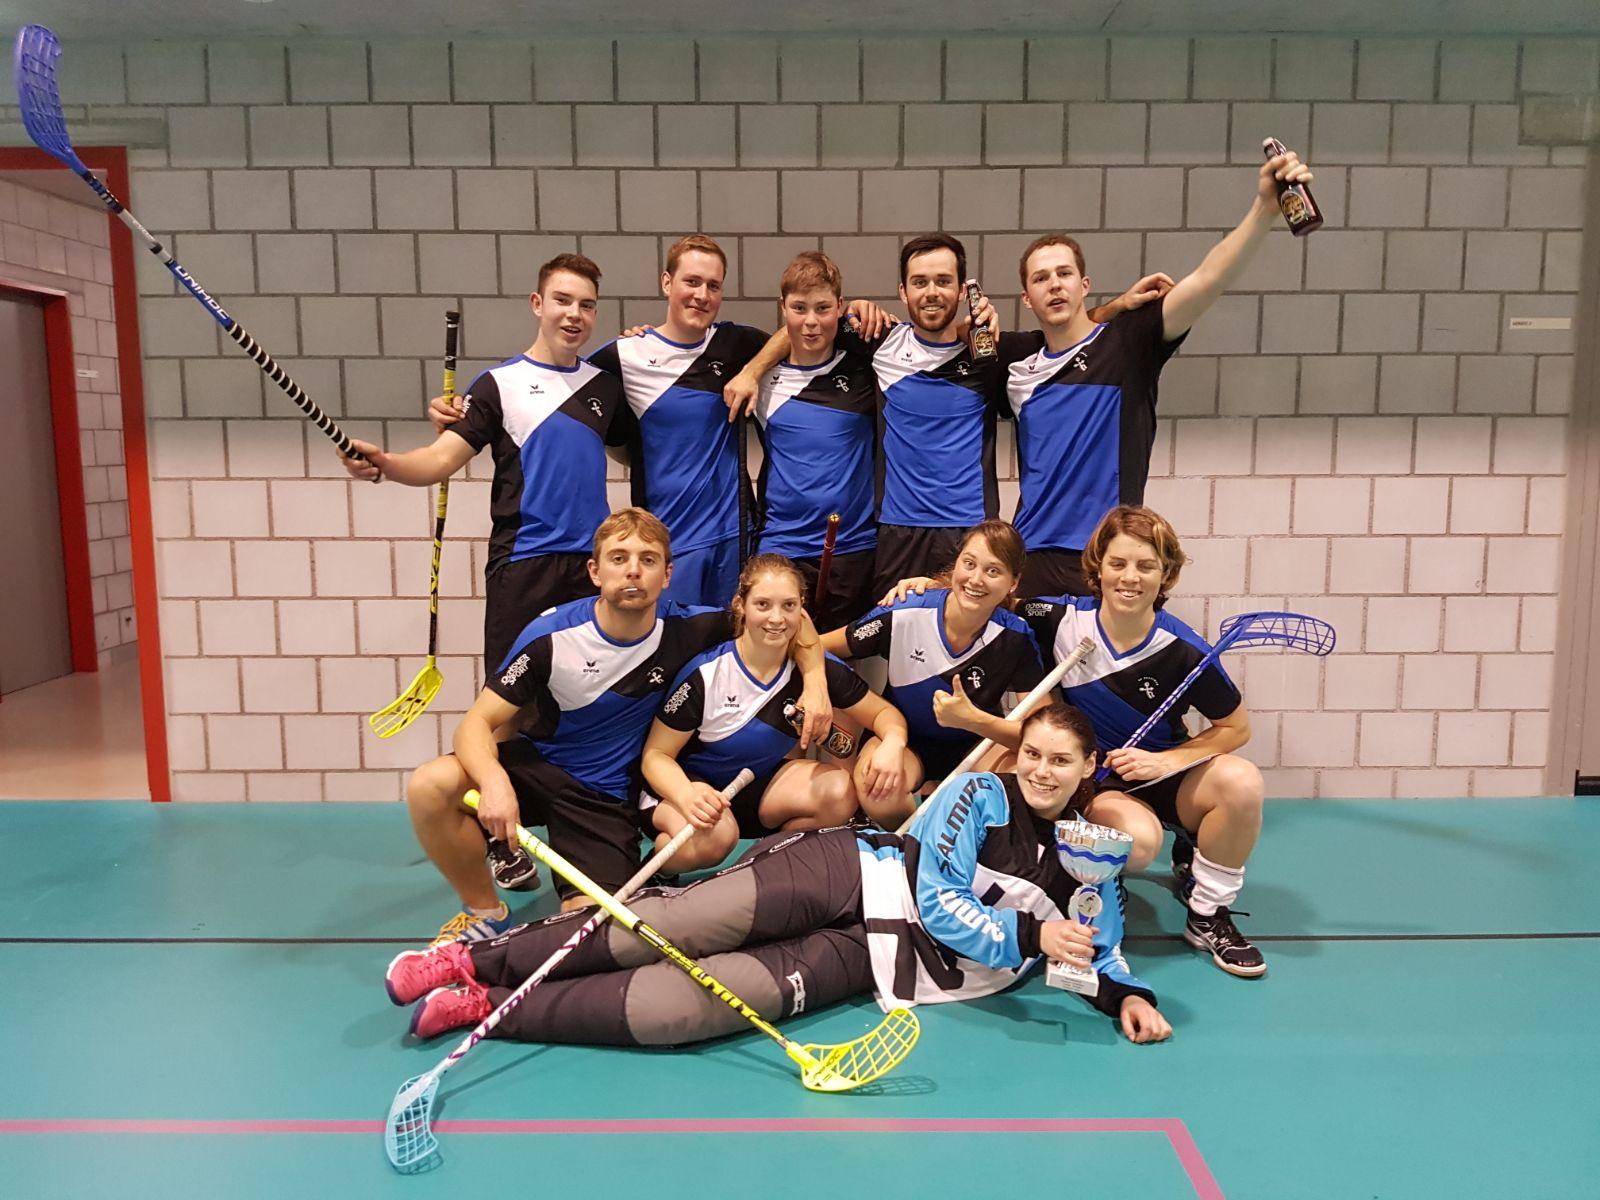 Unihockeynight Seftigen